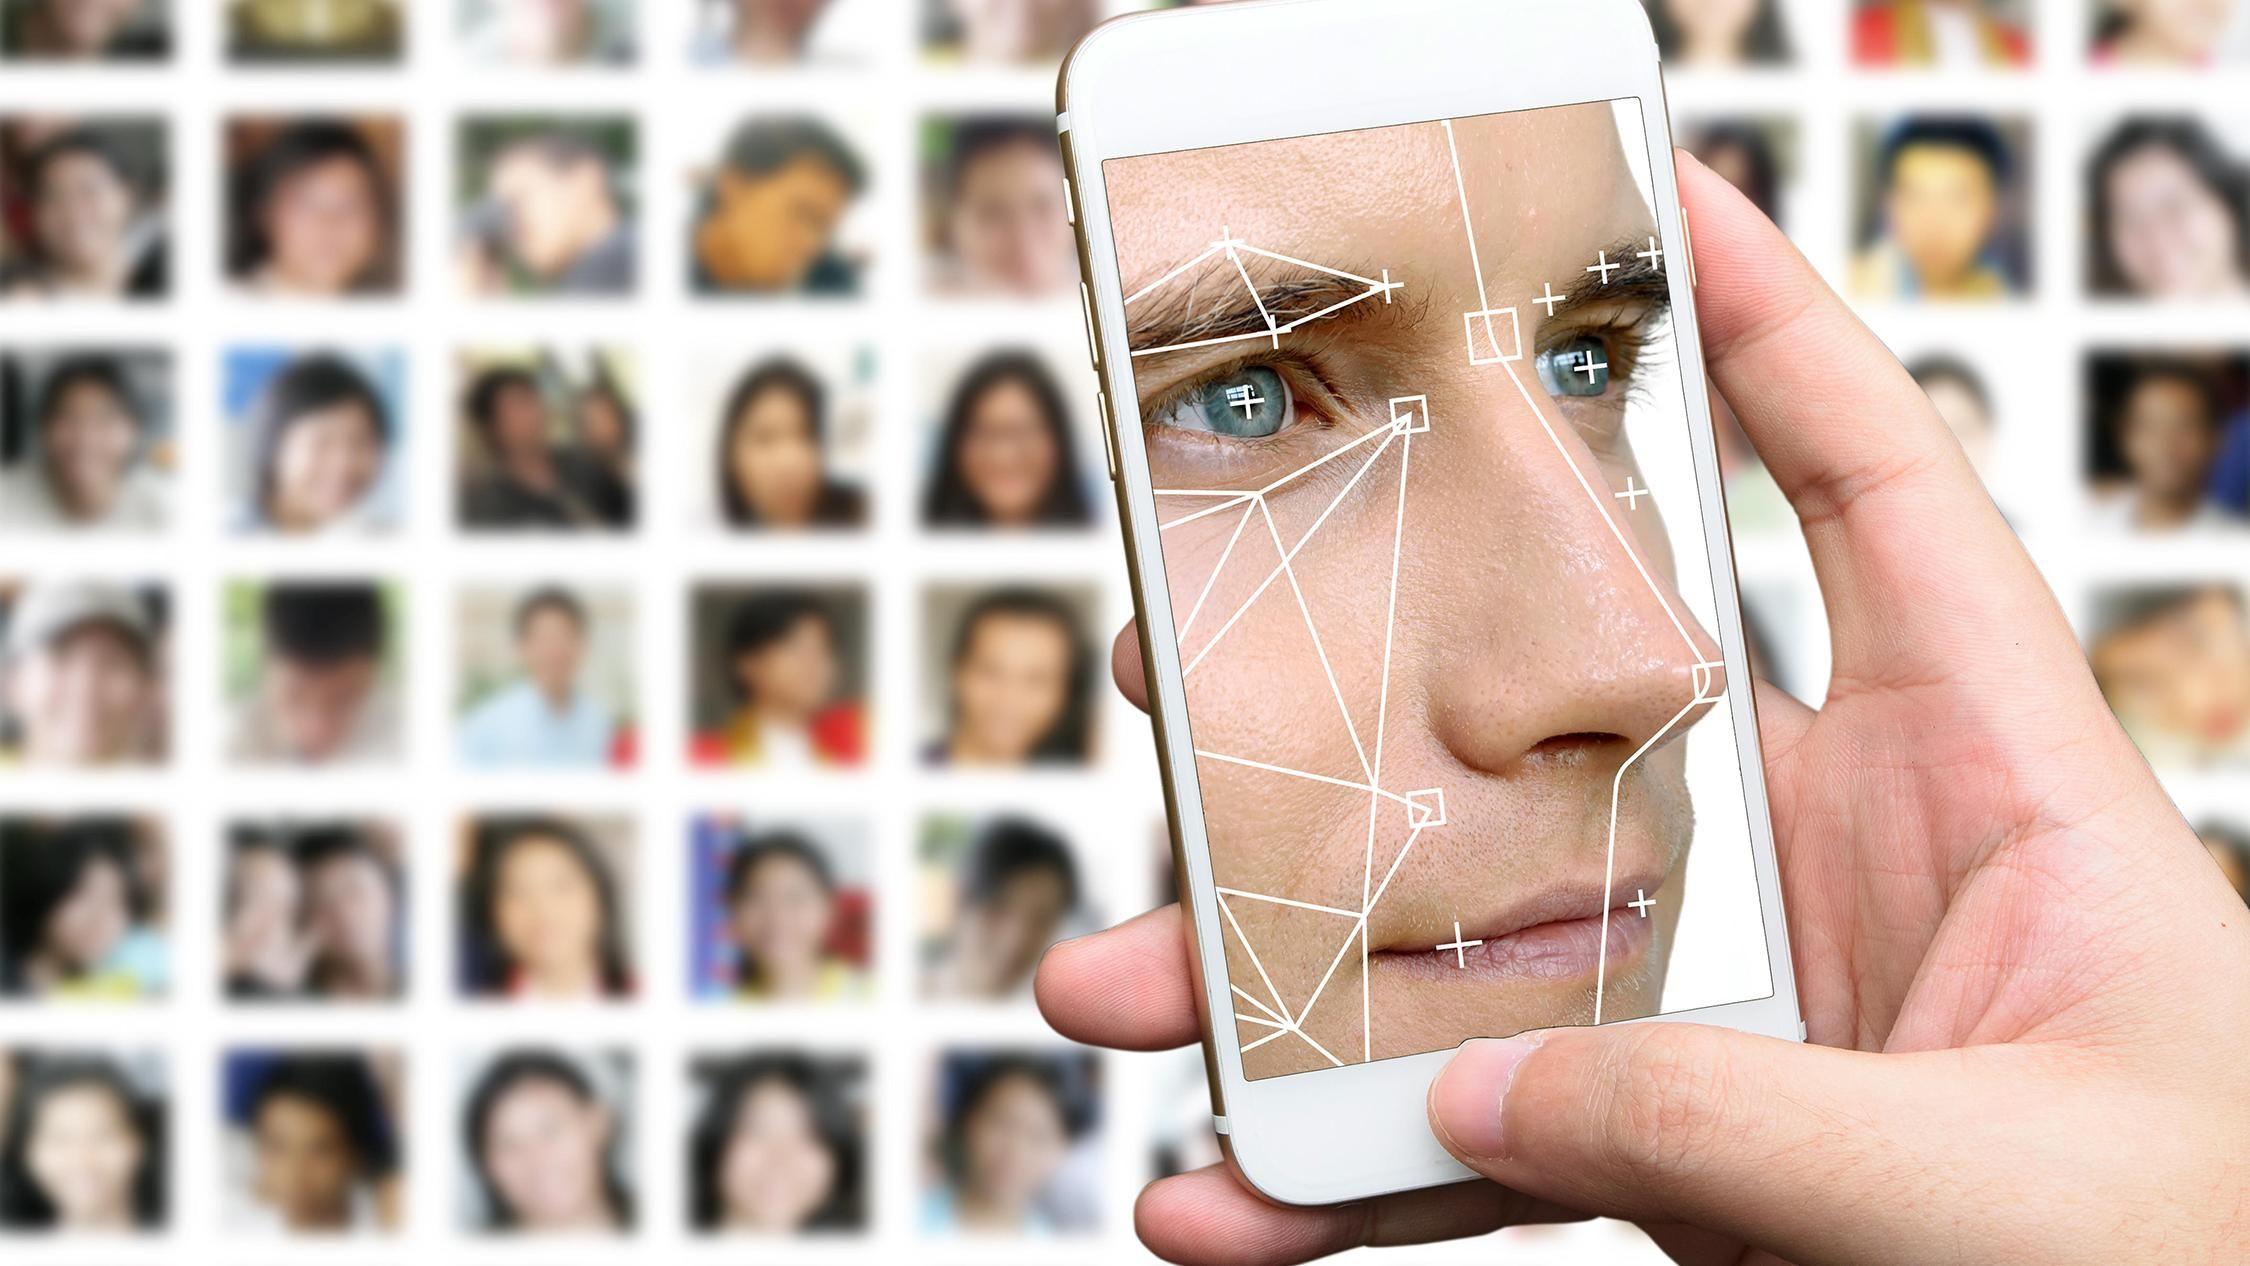 Microsoft faces up to racial recognition row Facial